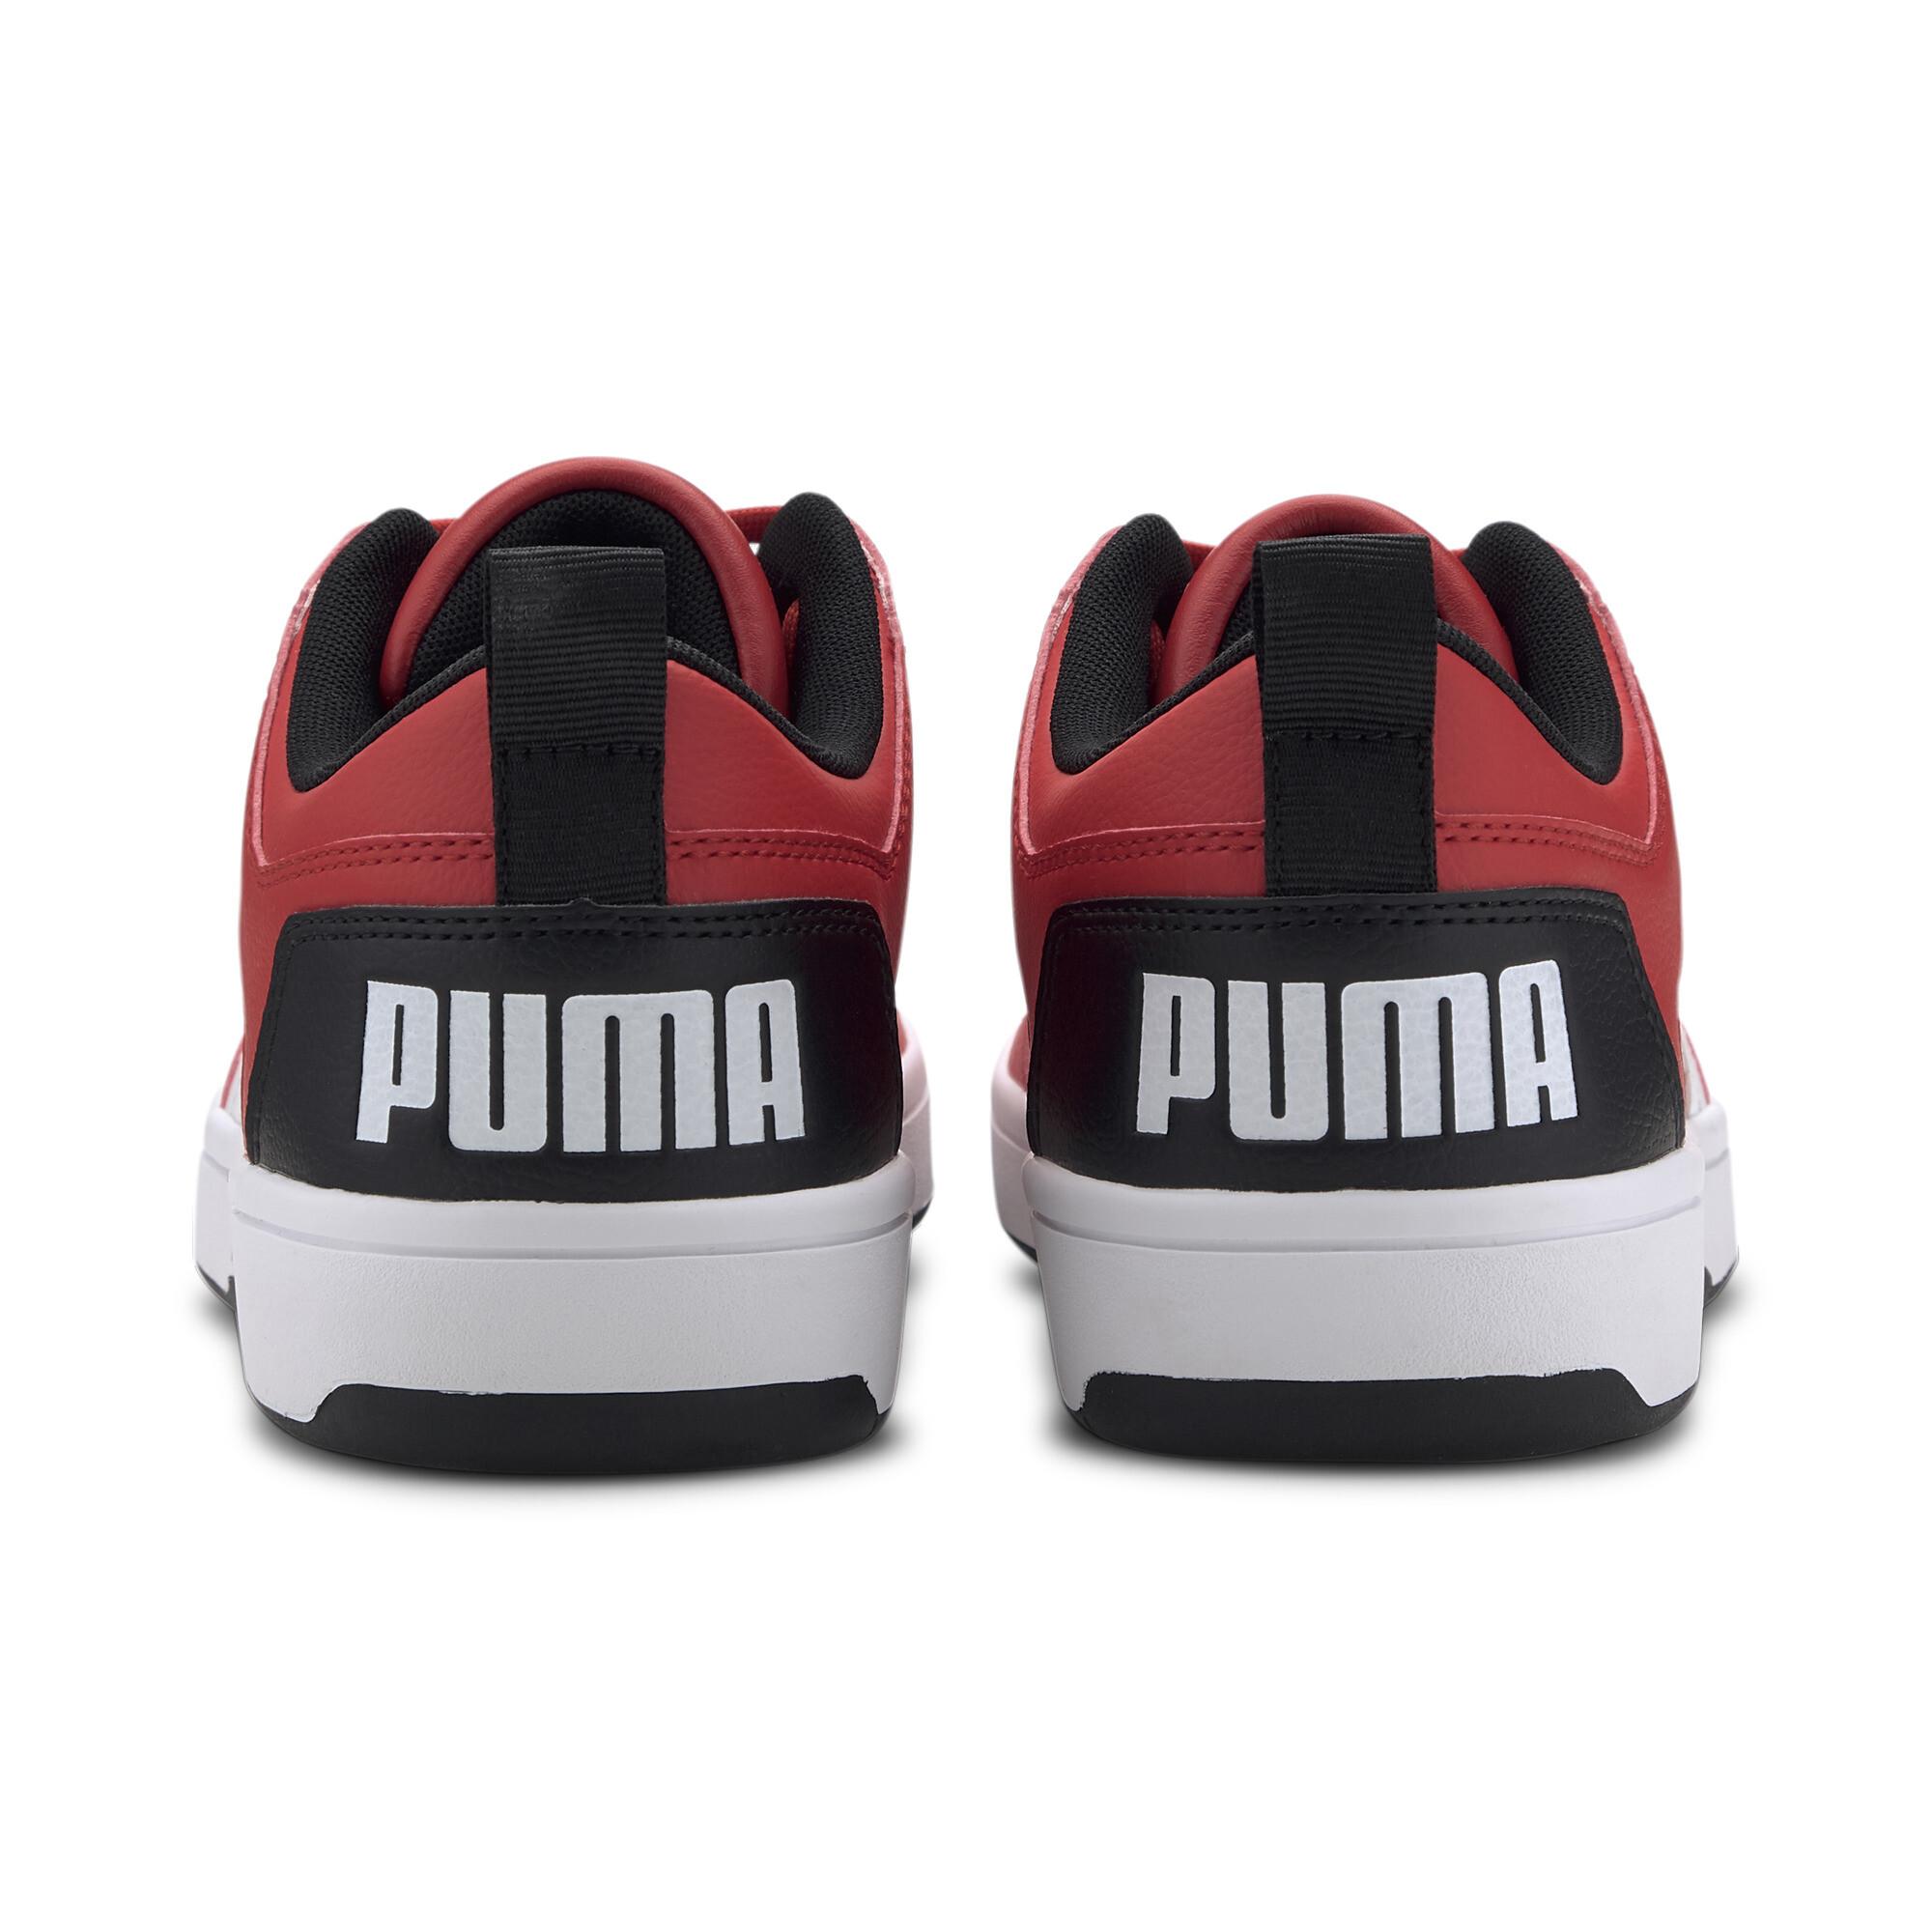 PUMA-PUMA-Rebound-LayUp-Lo-Men-039-s-Sneakers-Men-Shoe-Basics miniatura 17